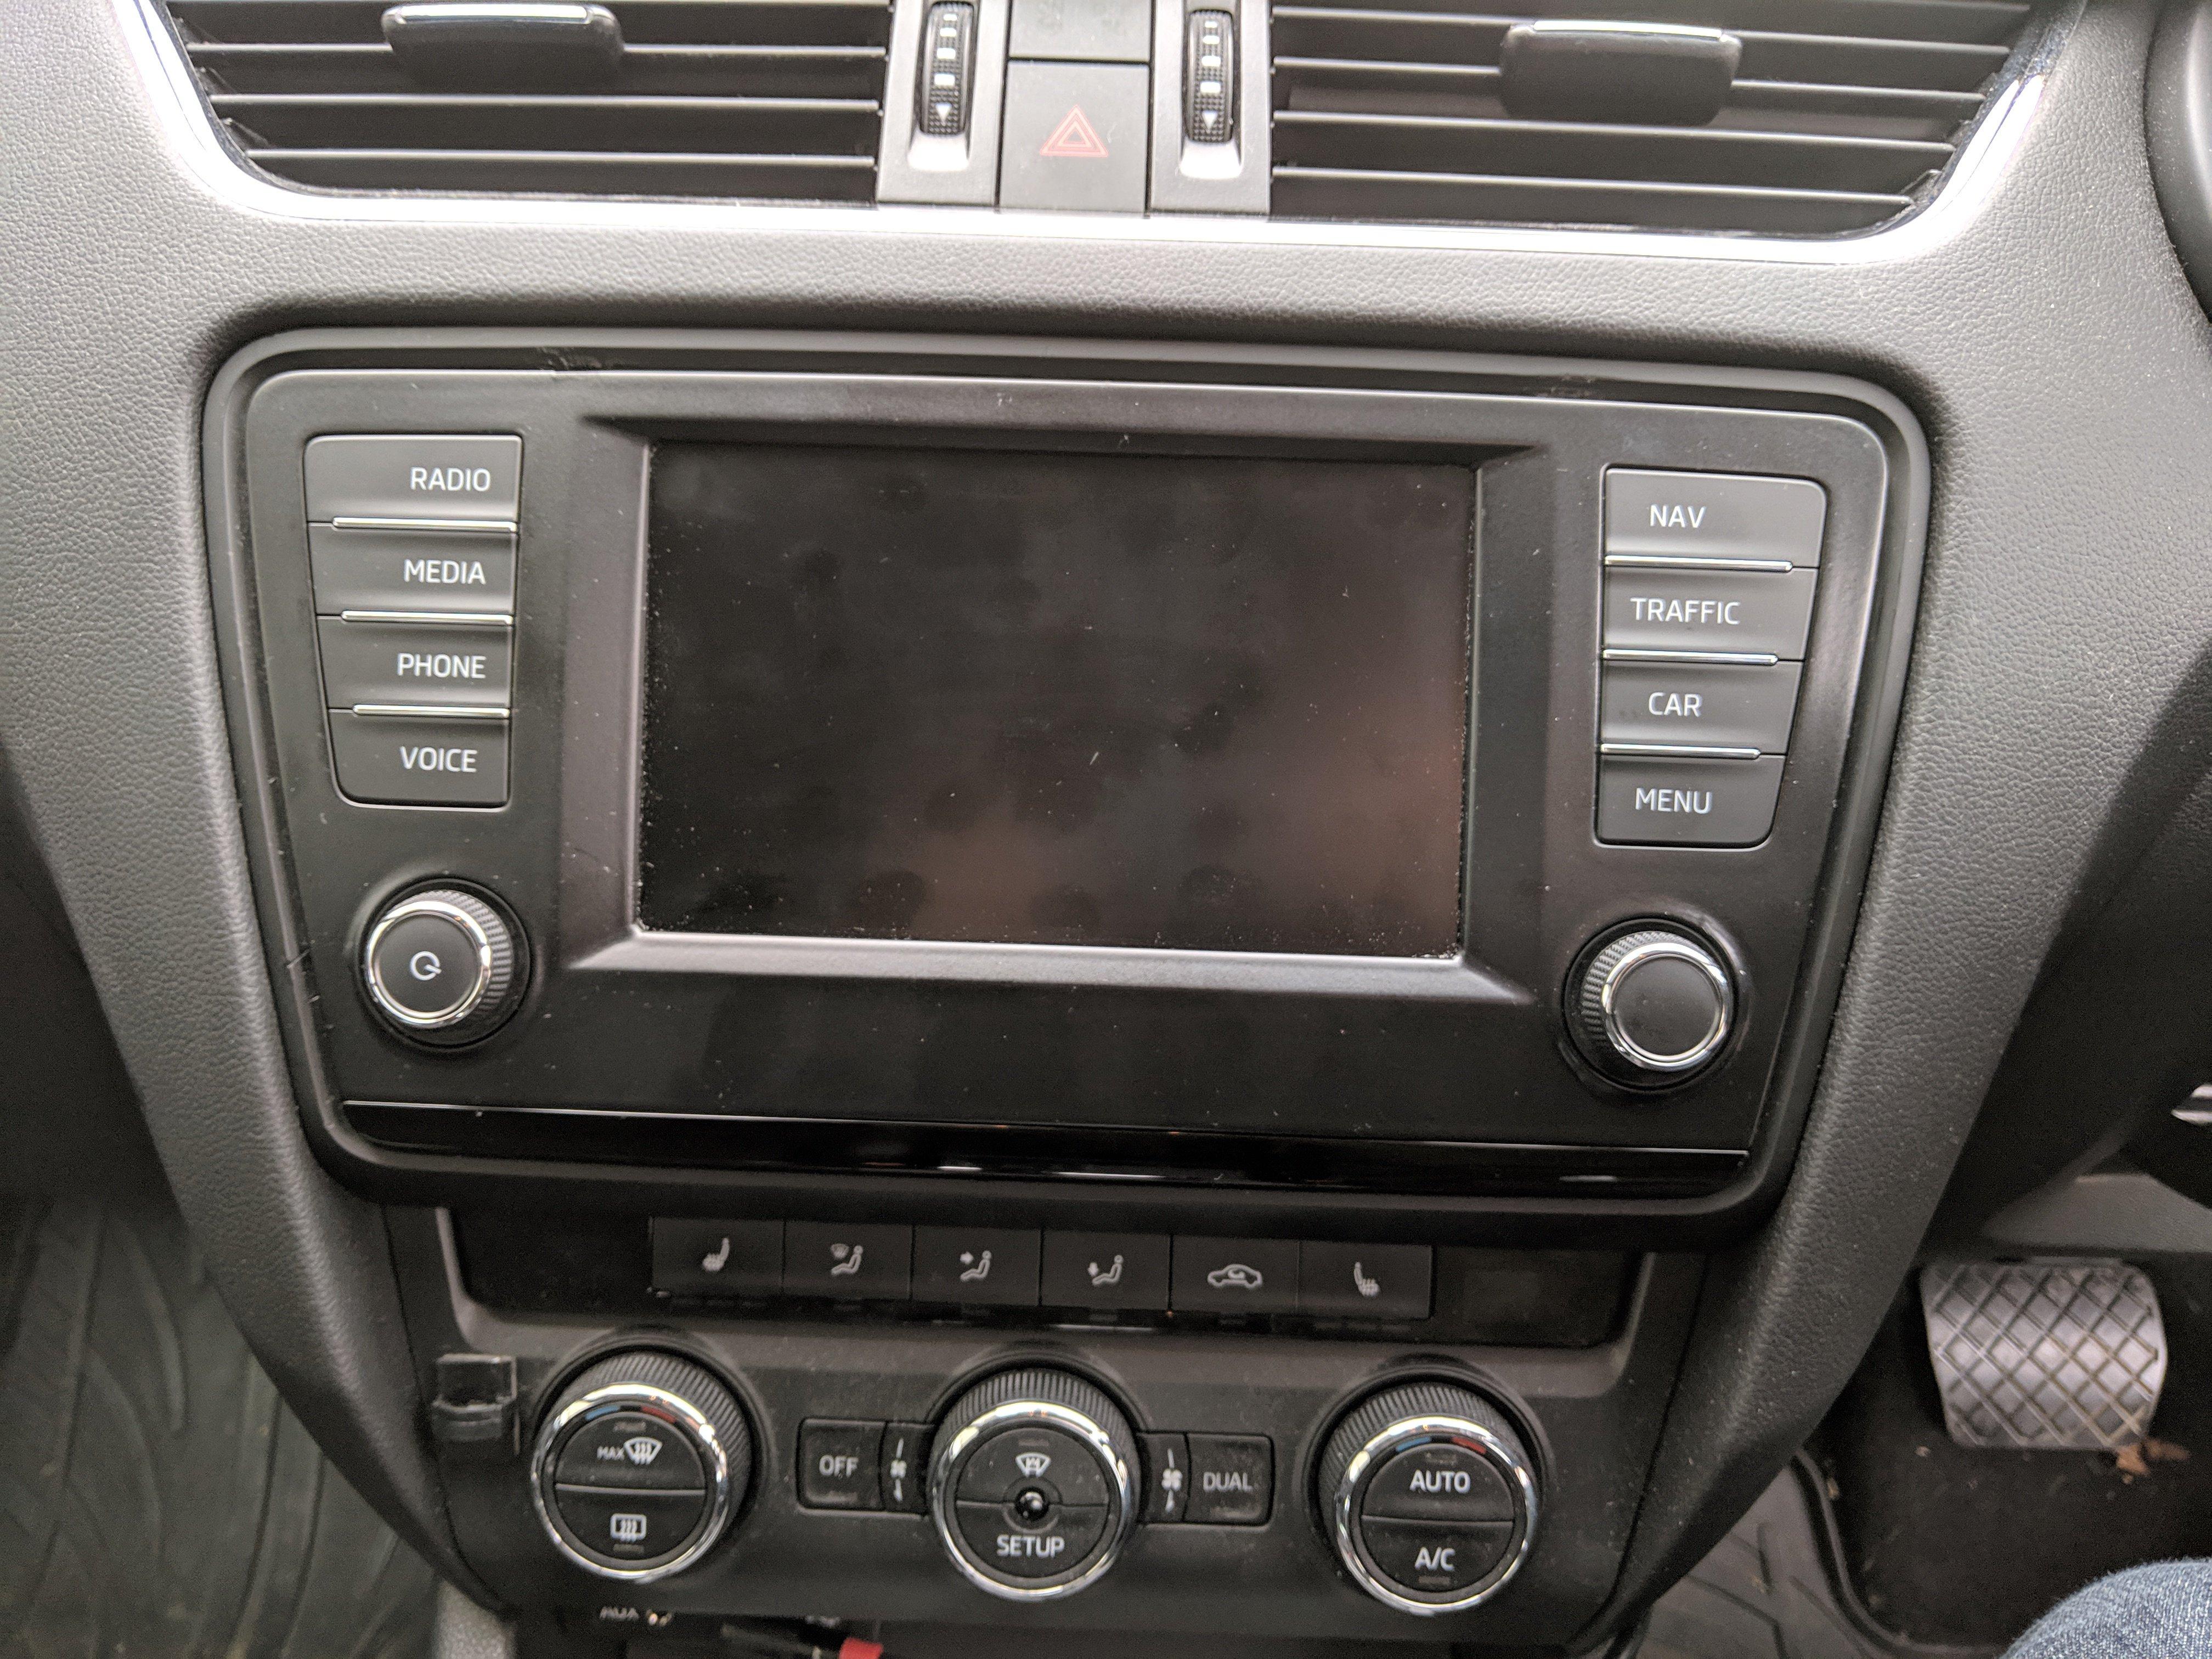 Android auto head unit - Skoda Octavia Mk III (2013 onward) - BRISKODA